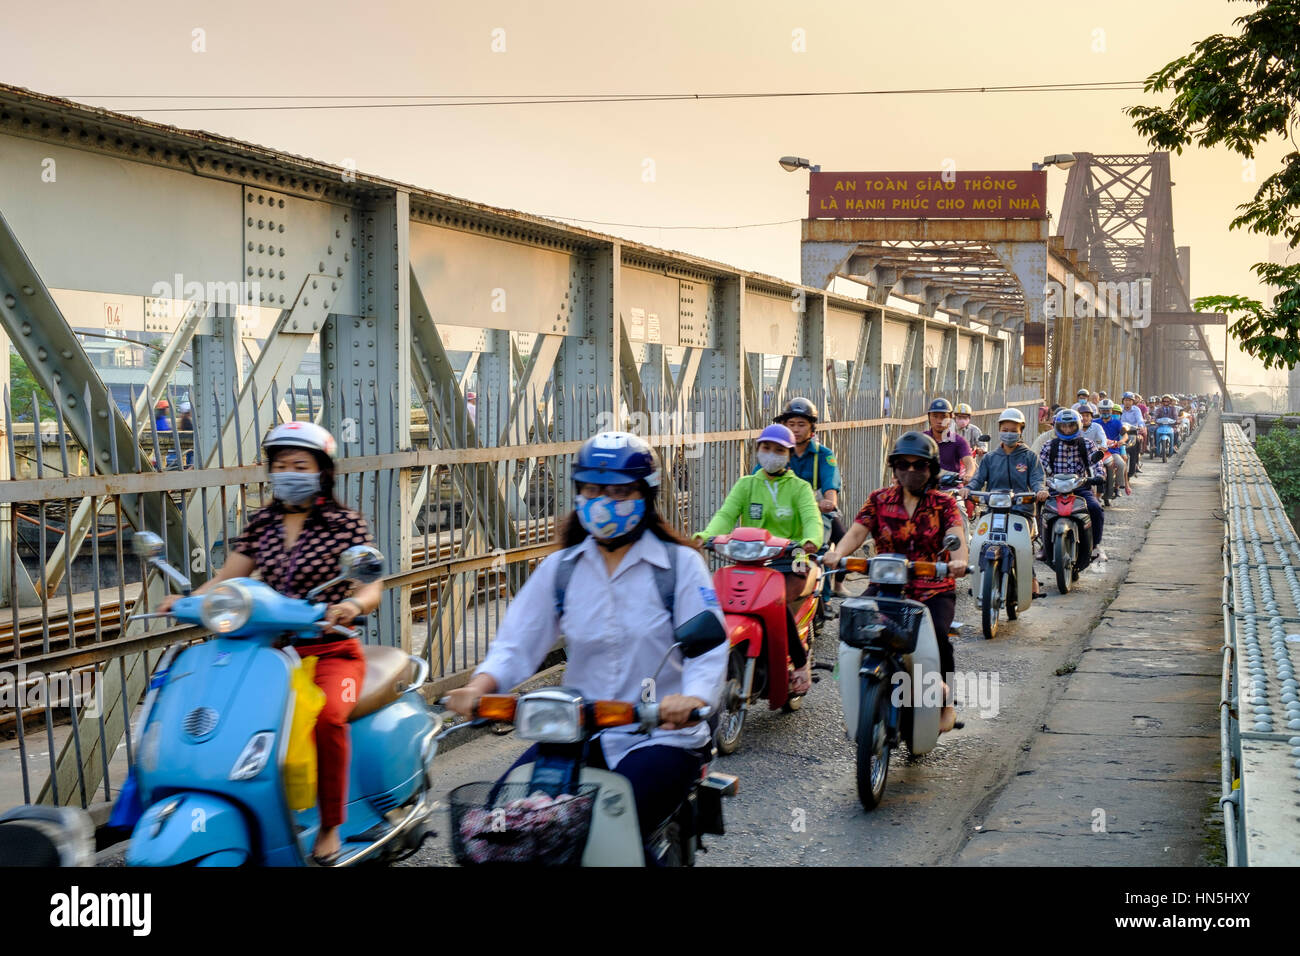 Pesante traffico pendolari sul passaggio pedonale del lungo Bien ponte a sbalzo, Hanoi, Vietnam Immagini Stock